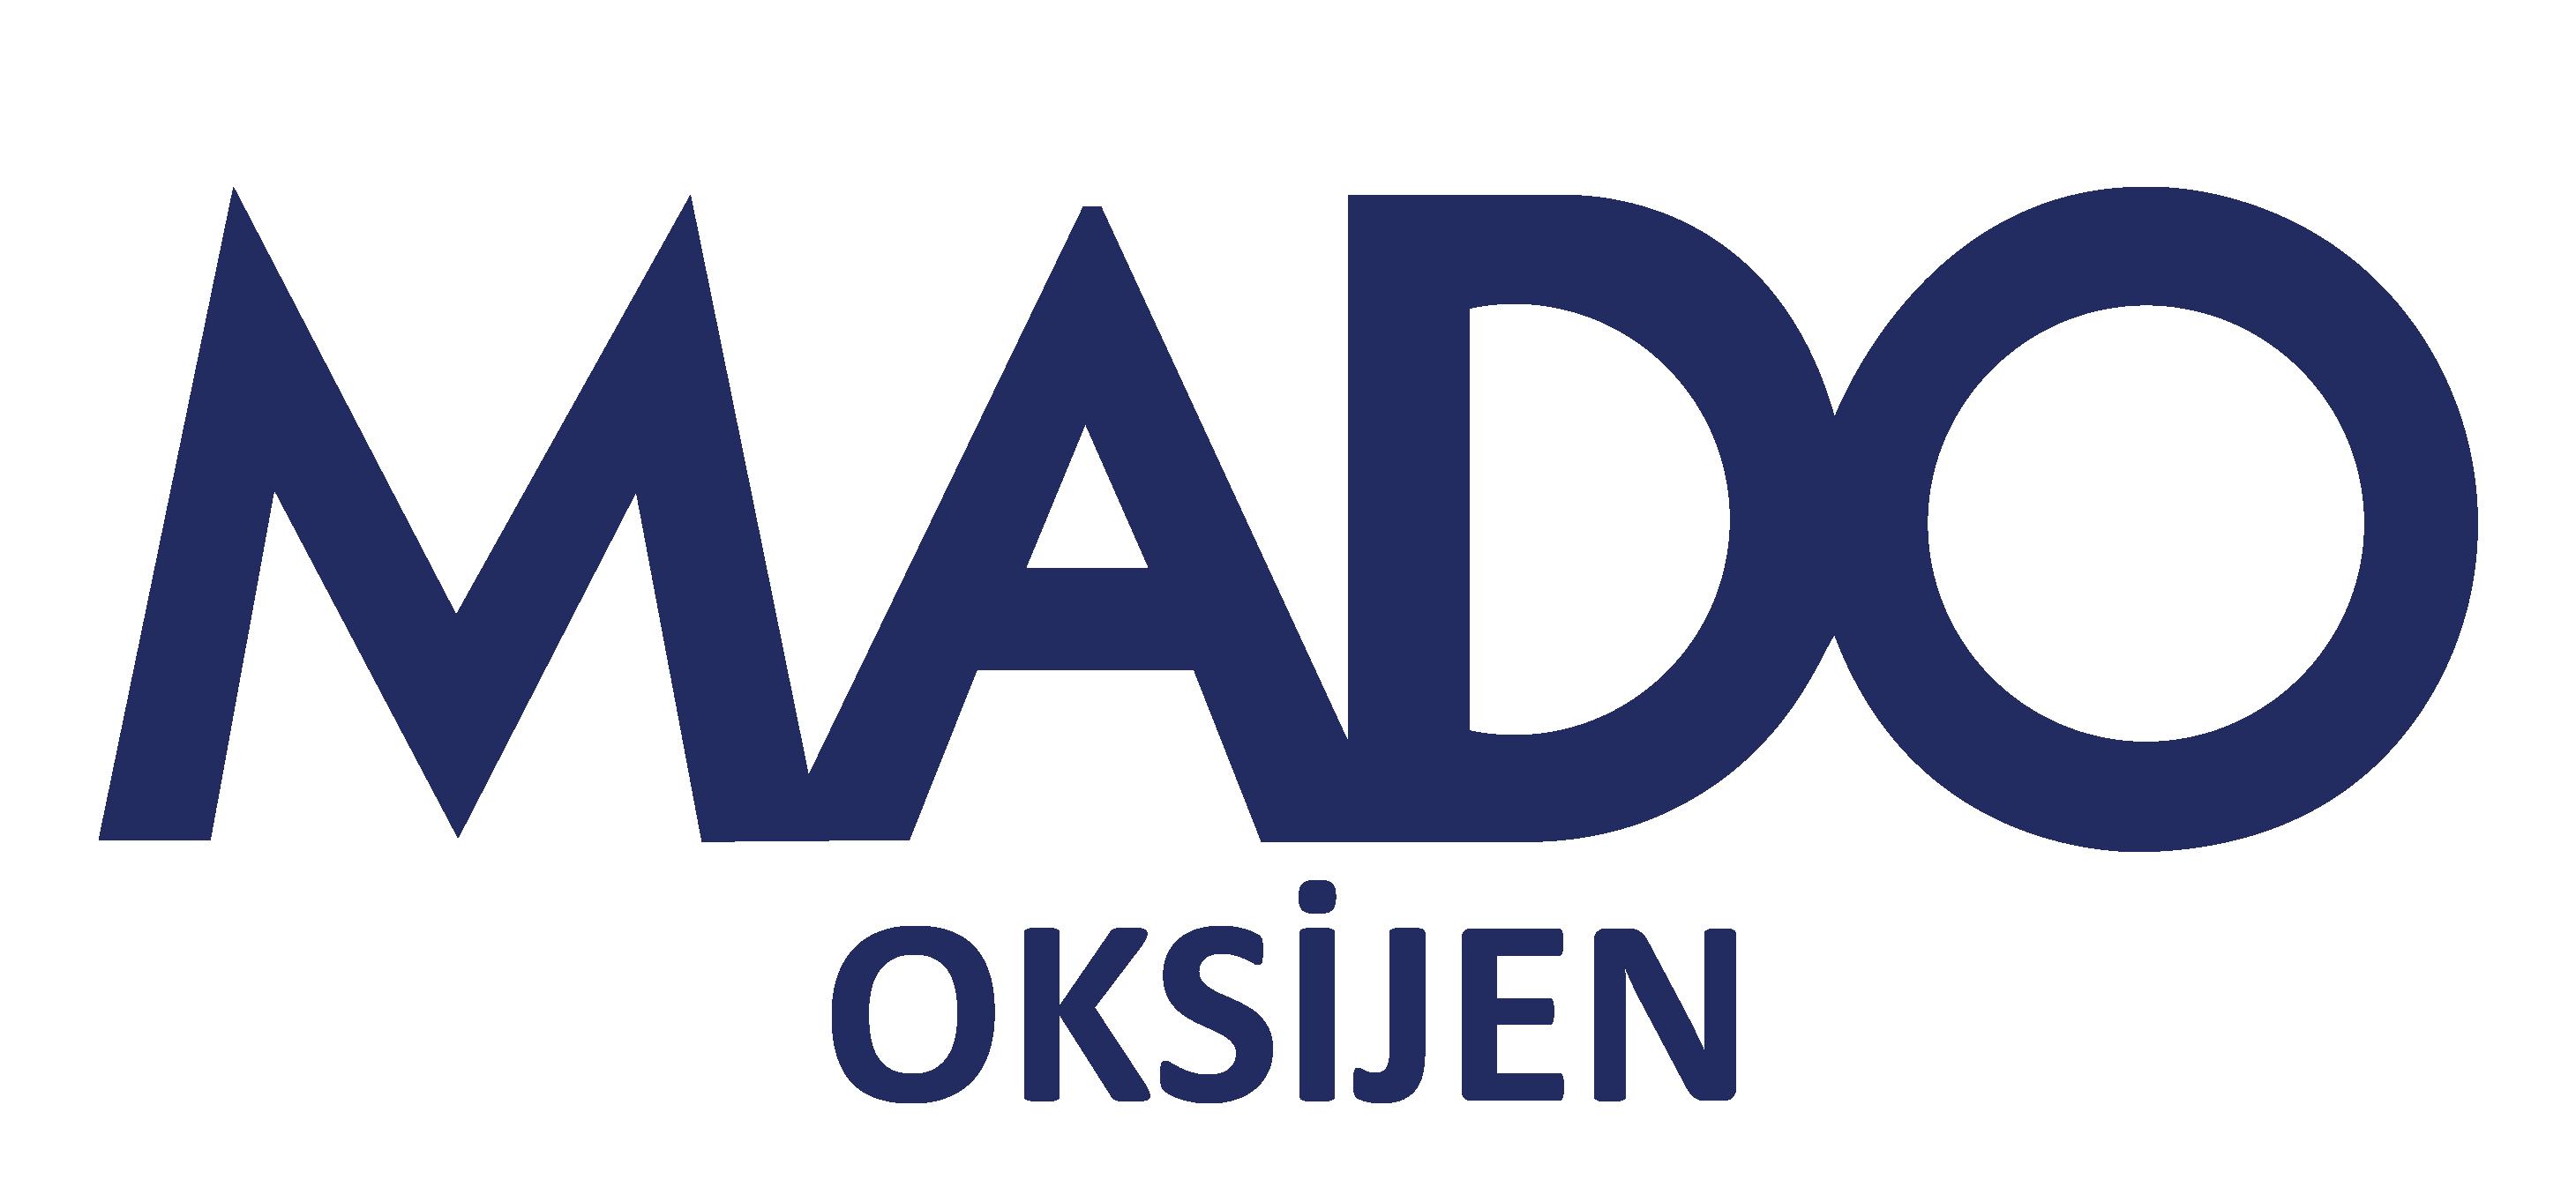 Oksijen Mado